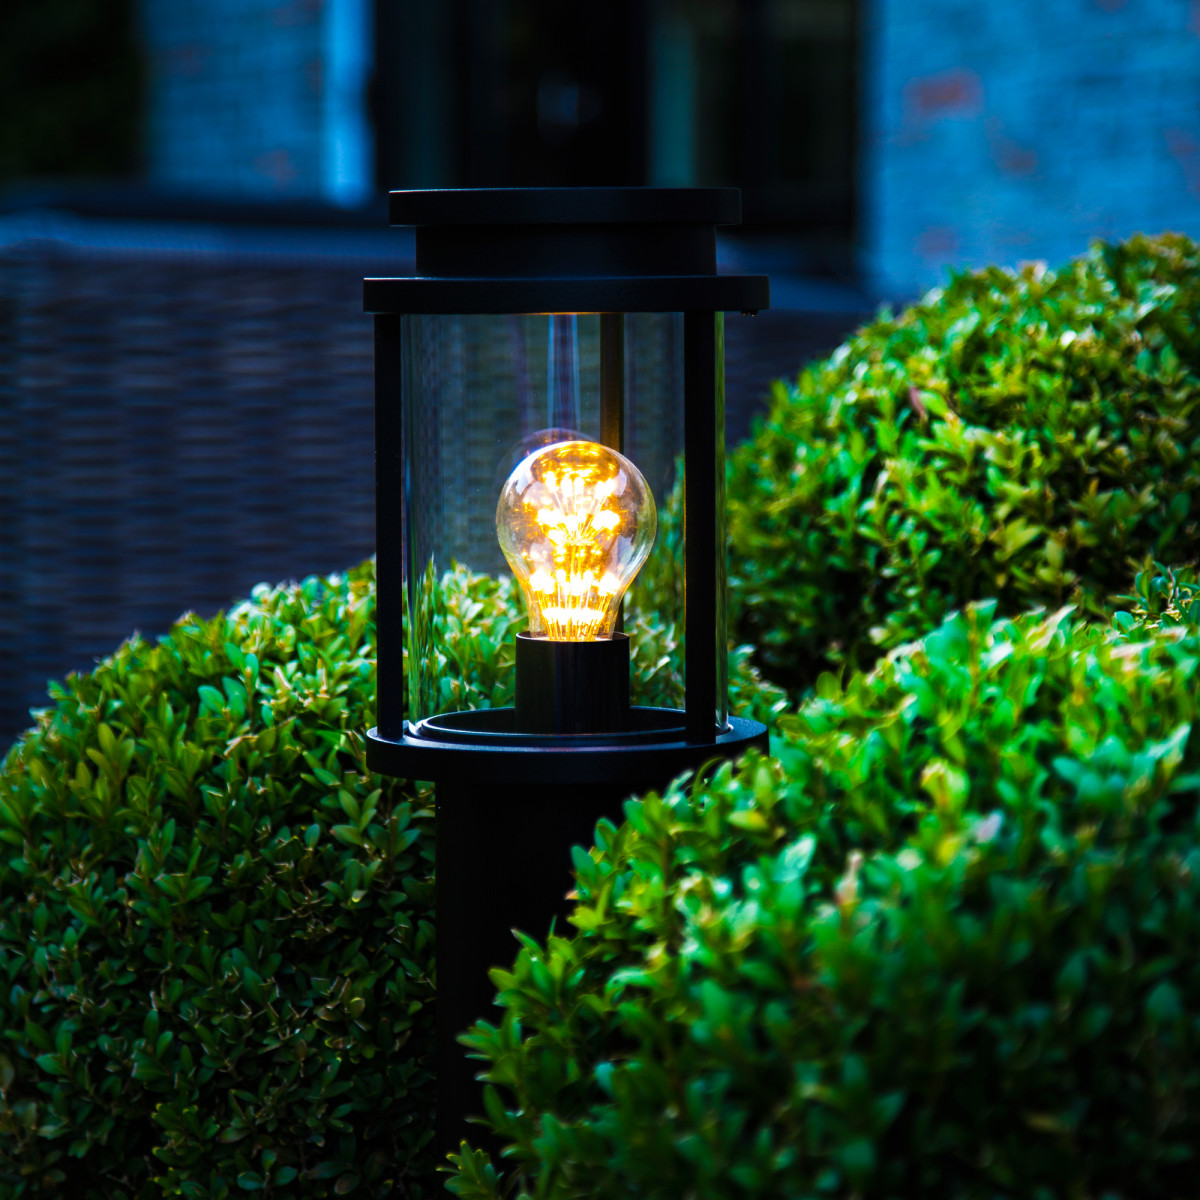 Staande zwarte buitenverlichting, tuinlamp Sydney terras, strak moderne buitenverlichting, ronde lantaarnkap en paal